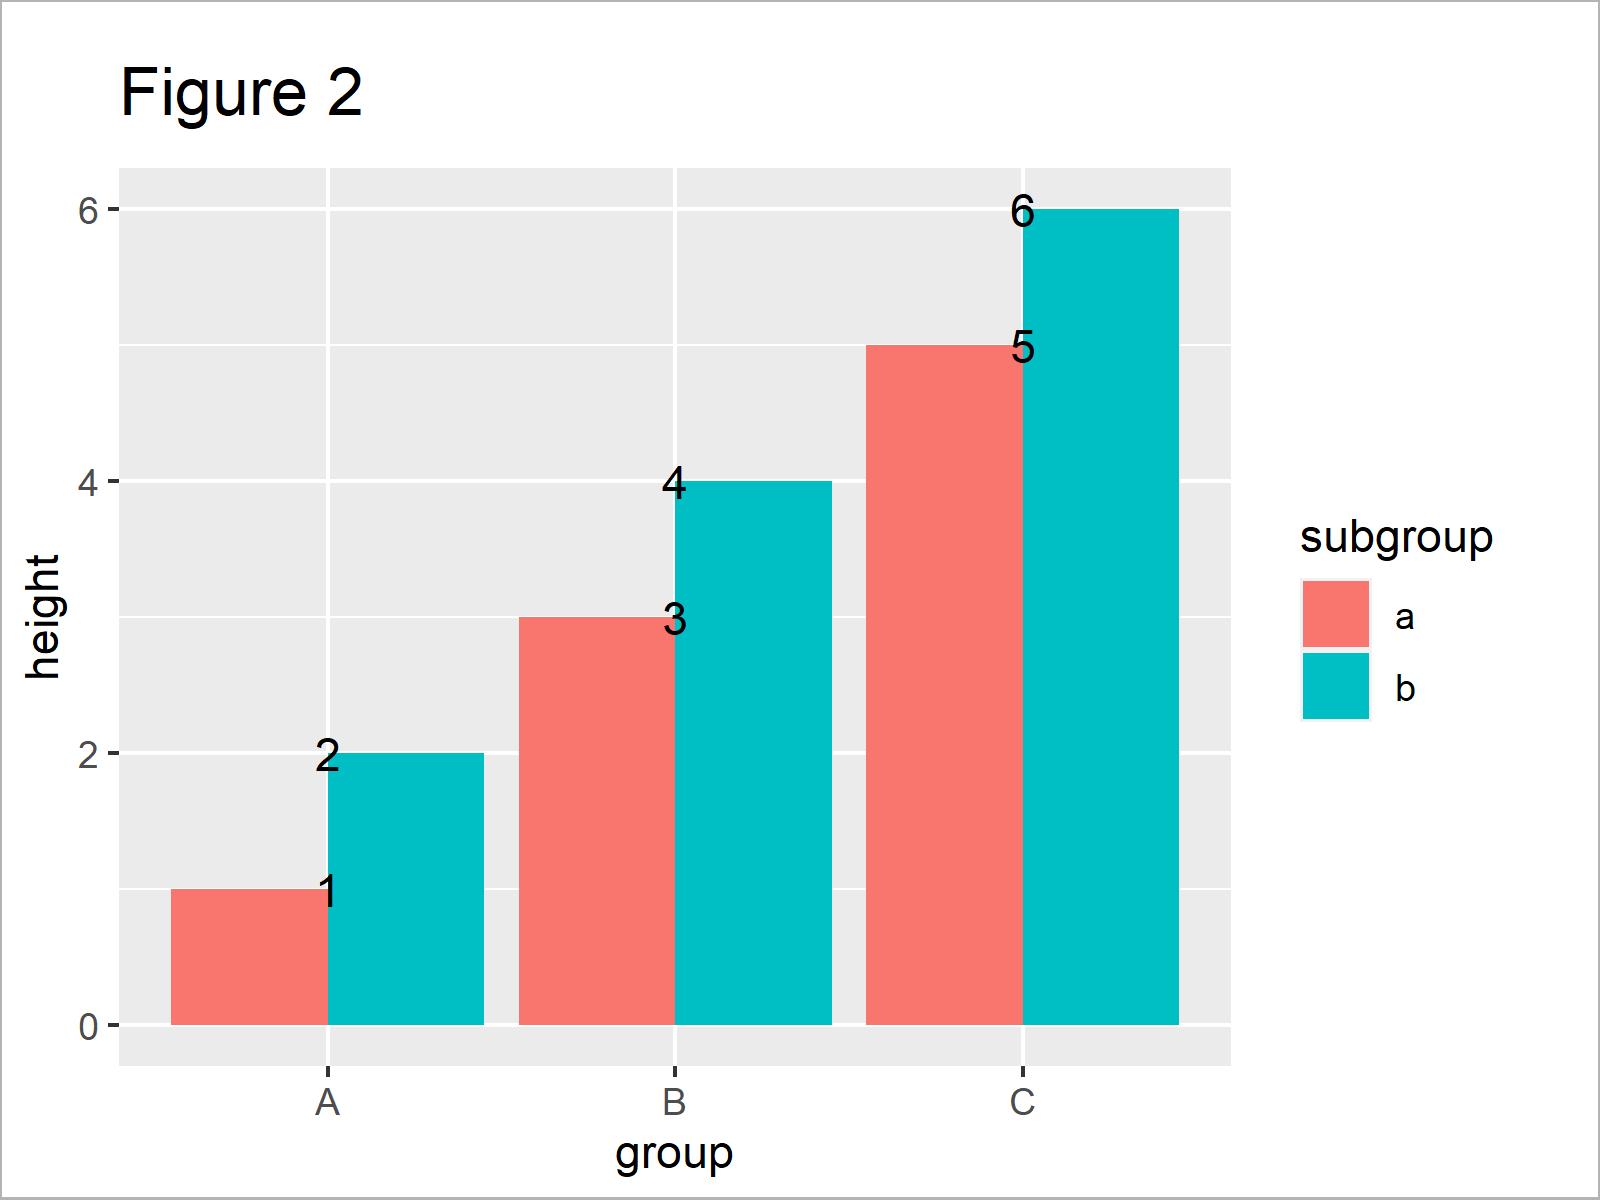 r graph figure 2 r position geom_text labels grouped ggplot2 barplot